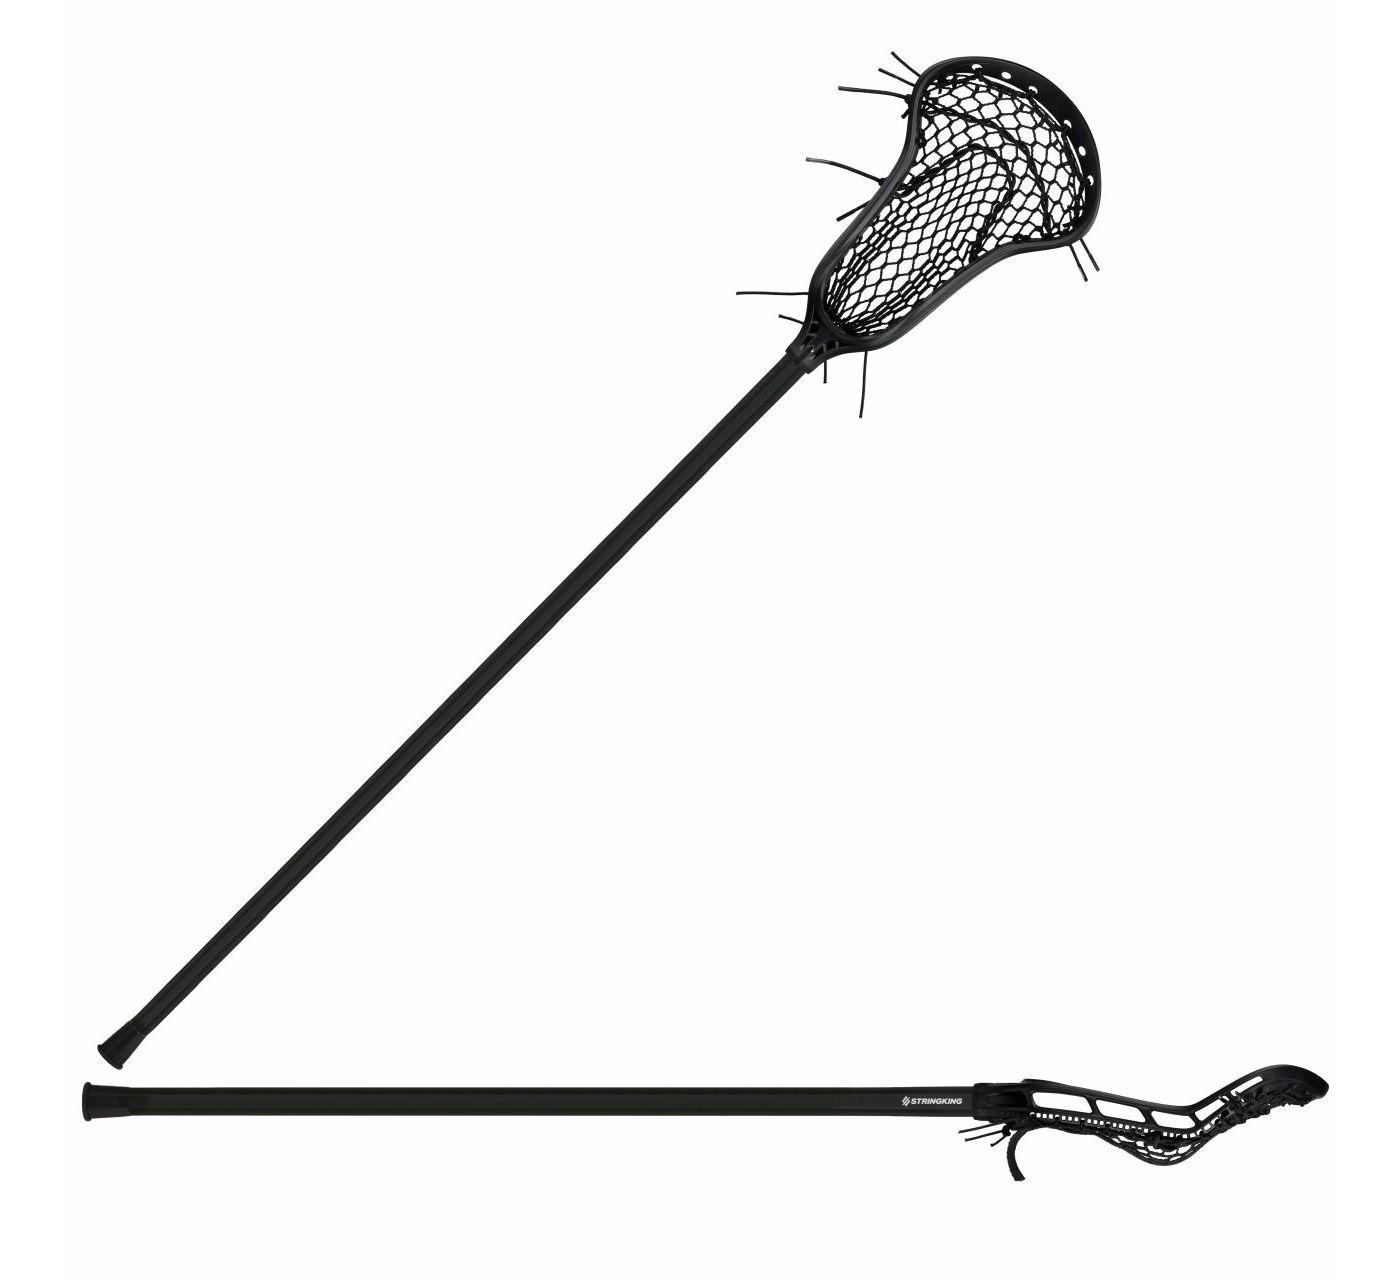 StringKing Women's Complete 2 Pro Offensive Metal Lacrosse Stick